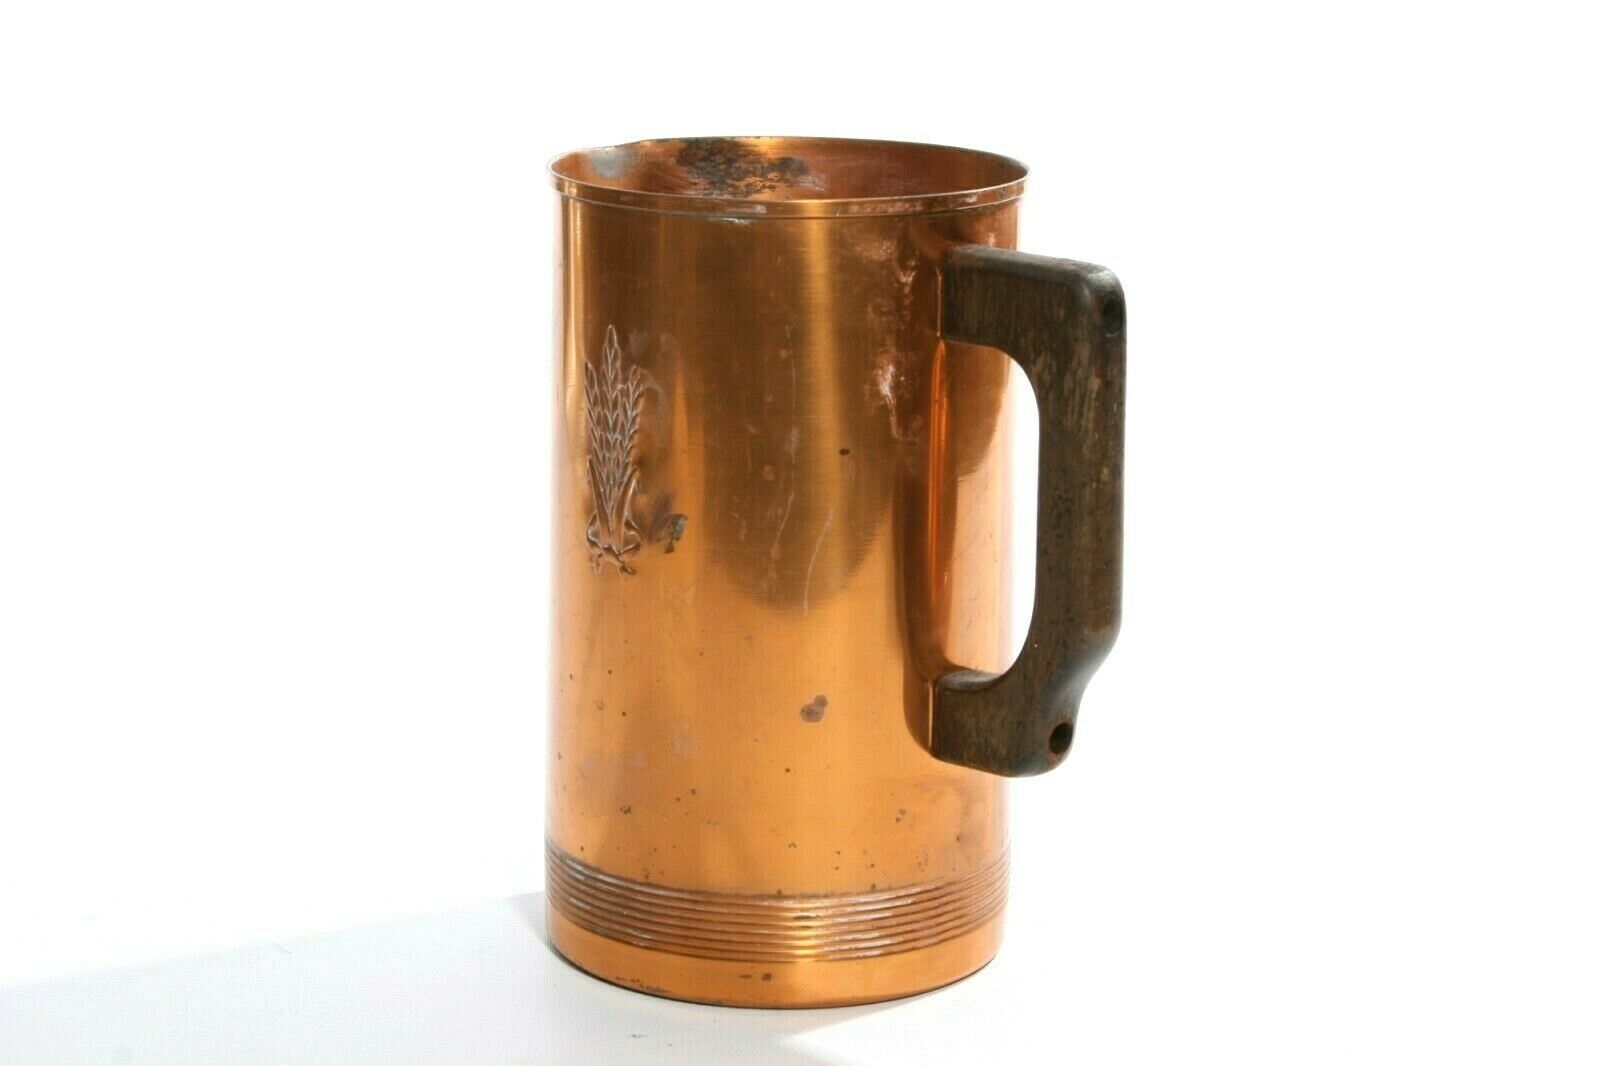 Vintage West Bend Aluminum Co 6Pc Solid Copper 4 Mugs, Pitcher & Tray / Platter